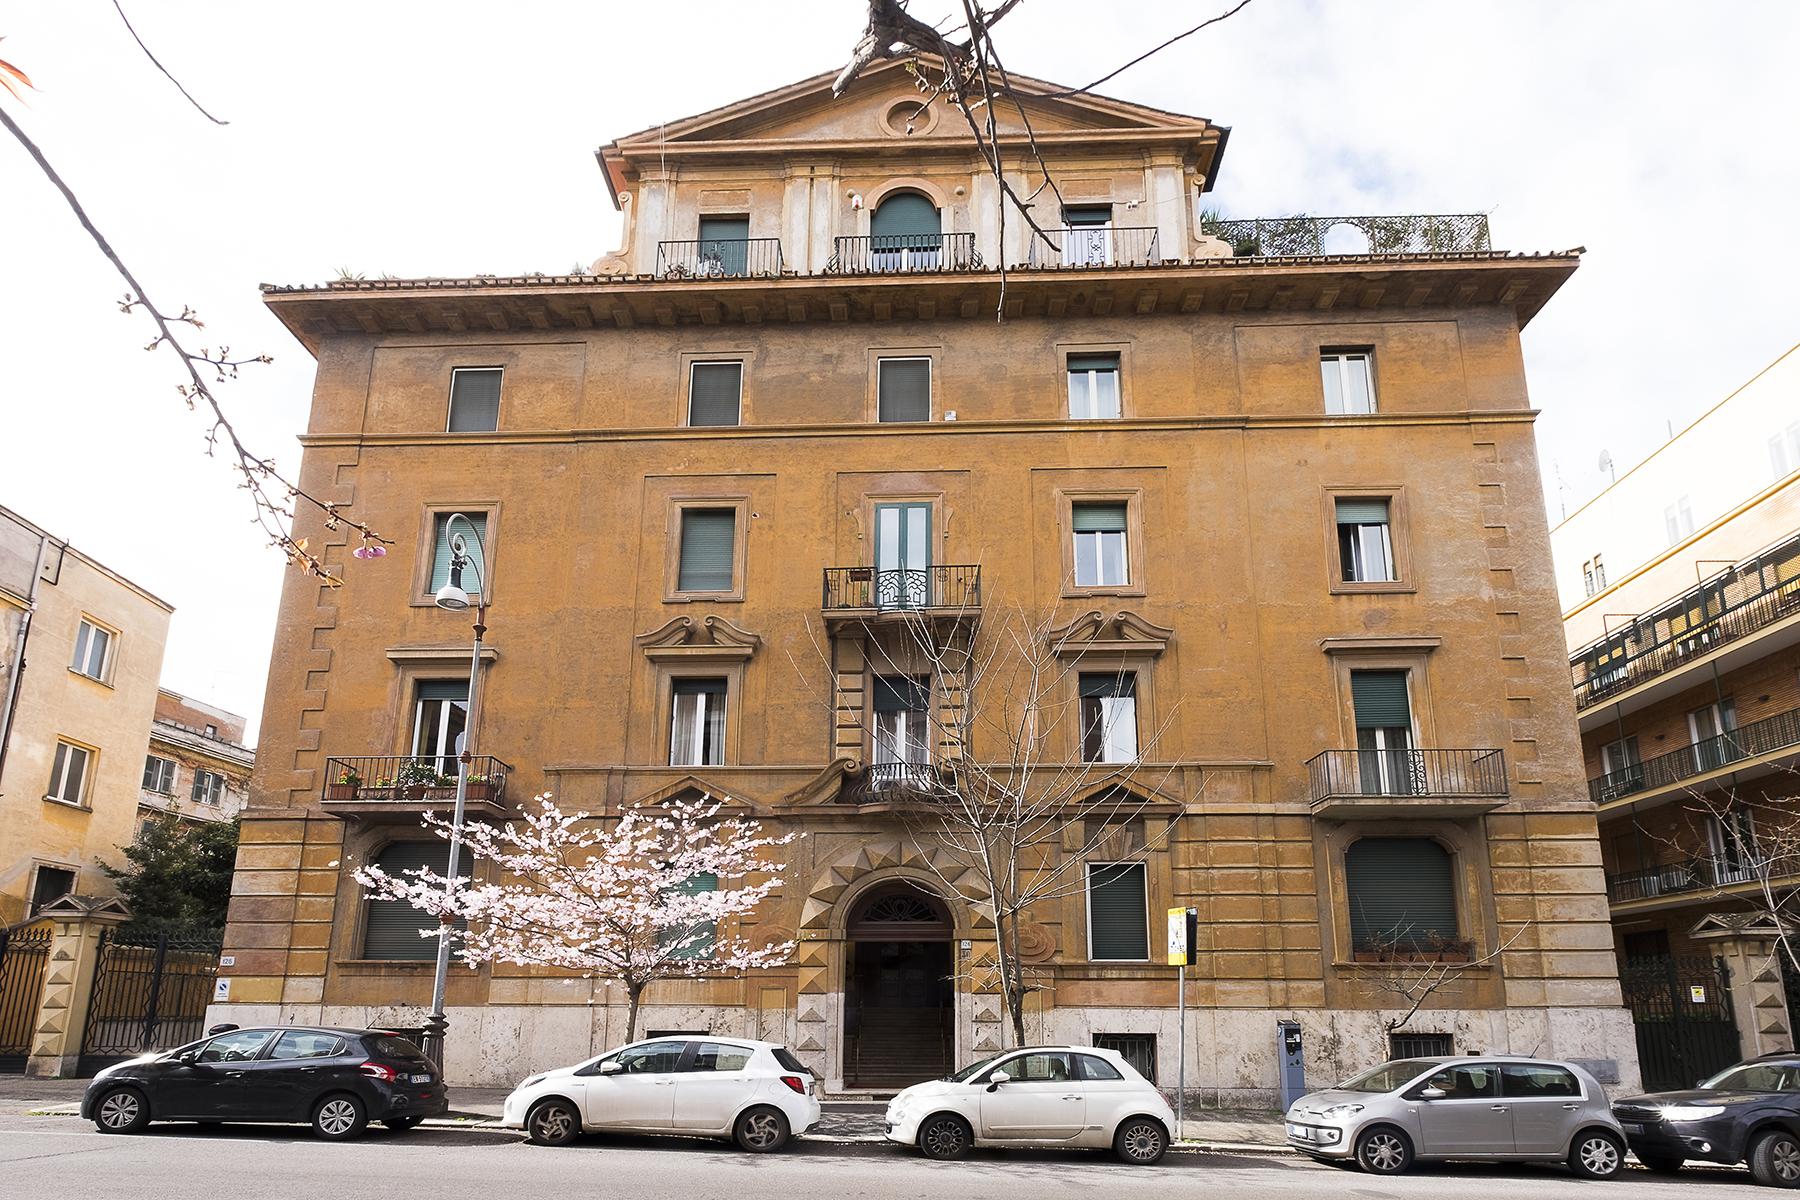 公寓 为 销售 在 Residential property for Sale in Roma (Italy) 罗马, 罗马, 意大利